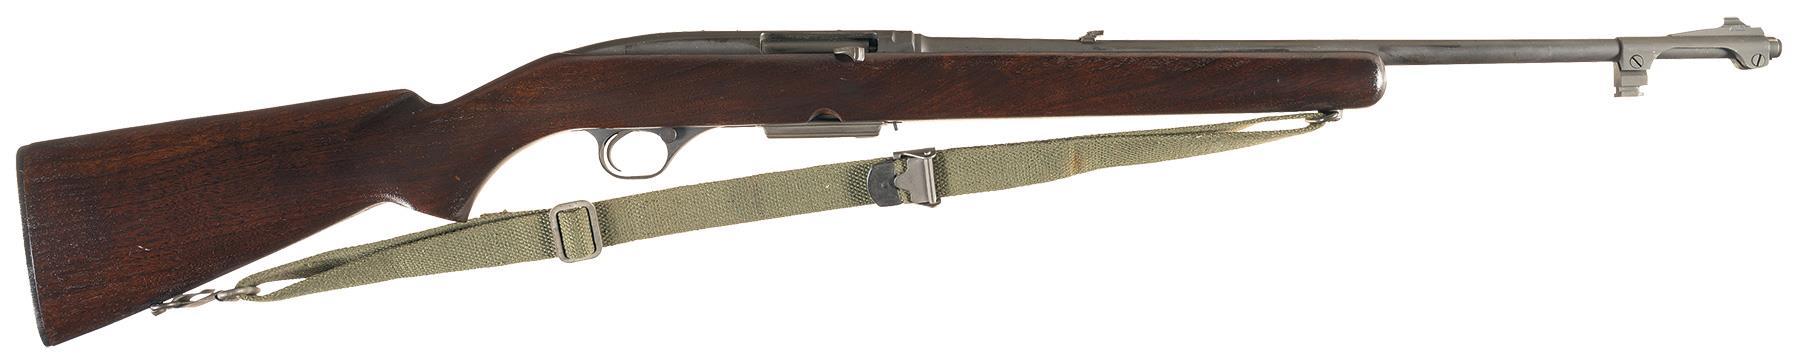 winchester military model 100 semi automatic rifle